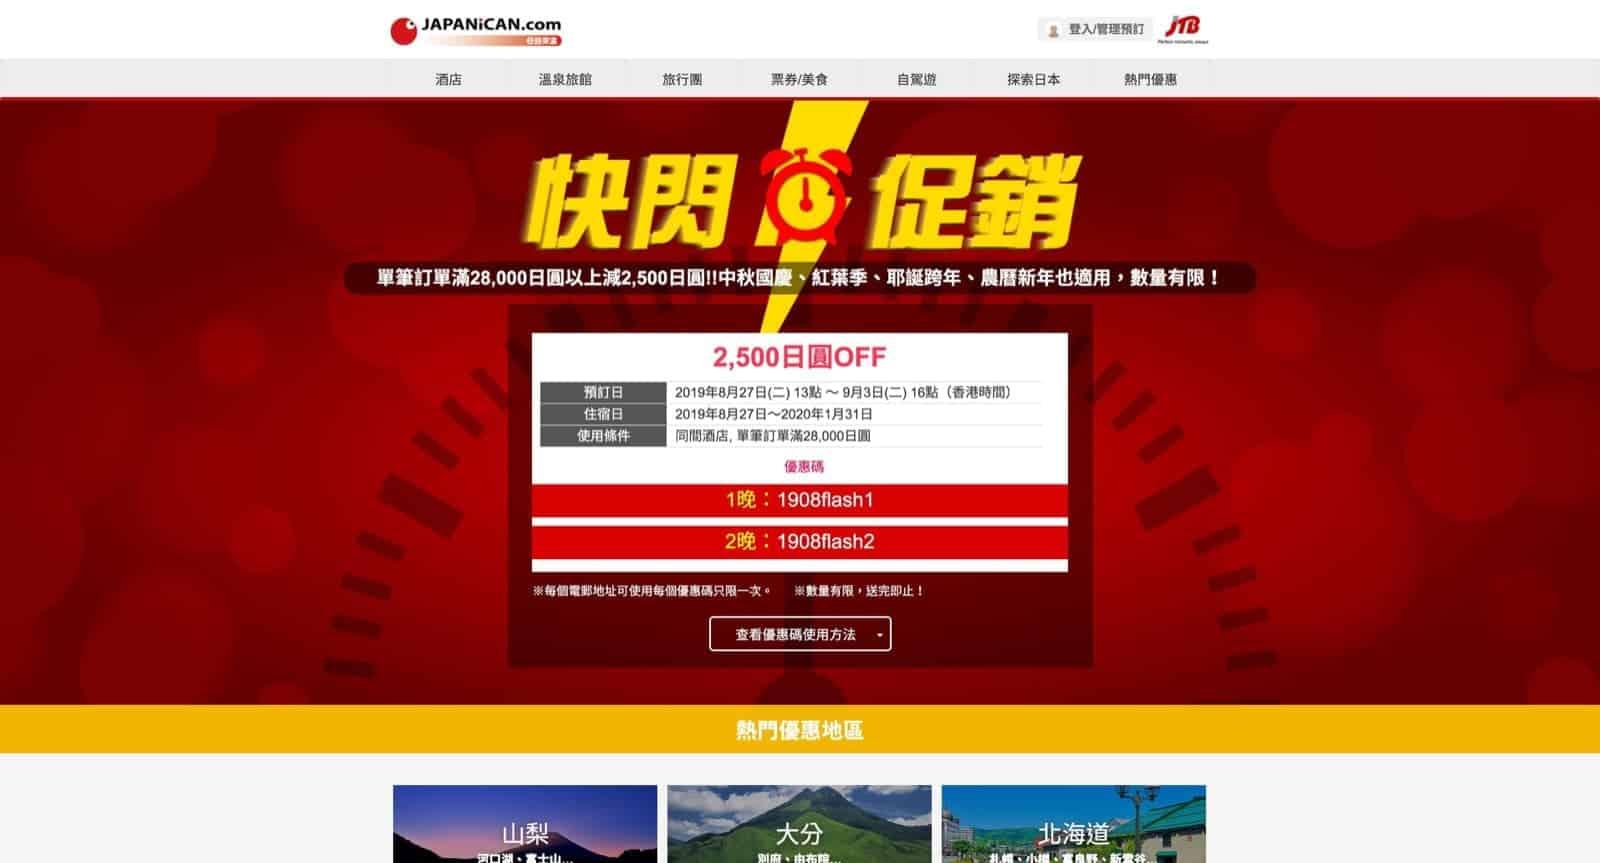 JAPANiCAN 2019年9月快閃優惠:訂日本酒店即減¥2500優惠碼 | 慳家@香港 HK